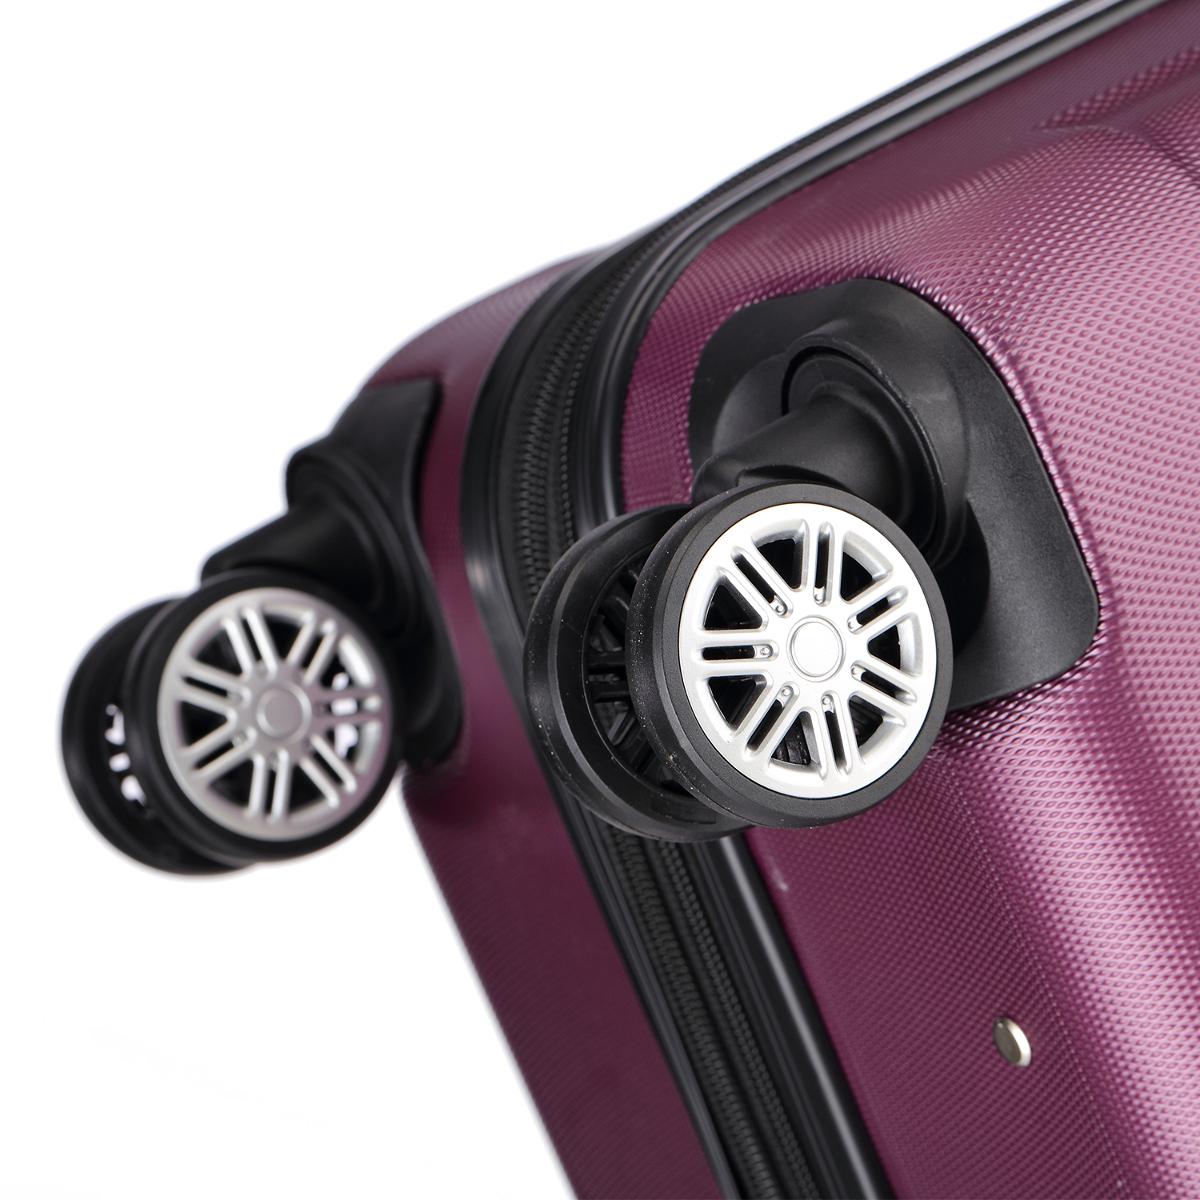 Koffer-Flexot-2045-Hartschalenkoffer-Trolley-Kofferset-Reisekoffer-M-L-XL-Set Indexbild 87